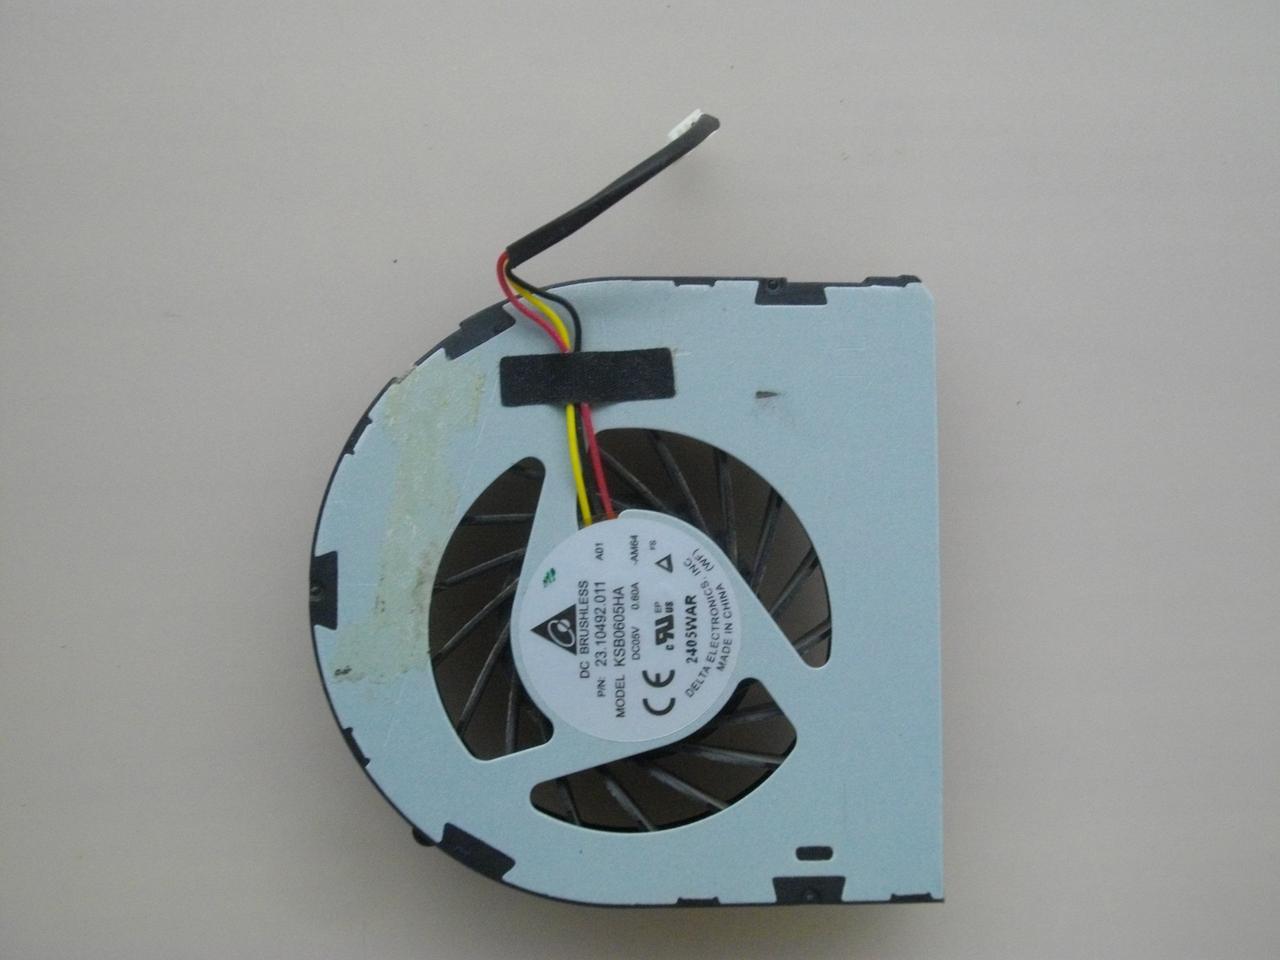 Вентилятор оригинальный KSB0605HA DELL Vostro 1540